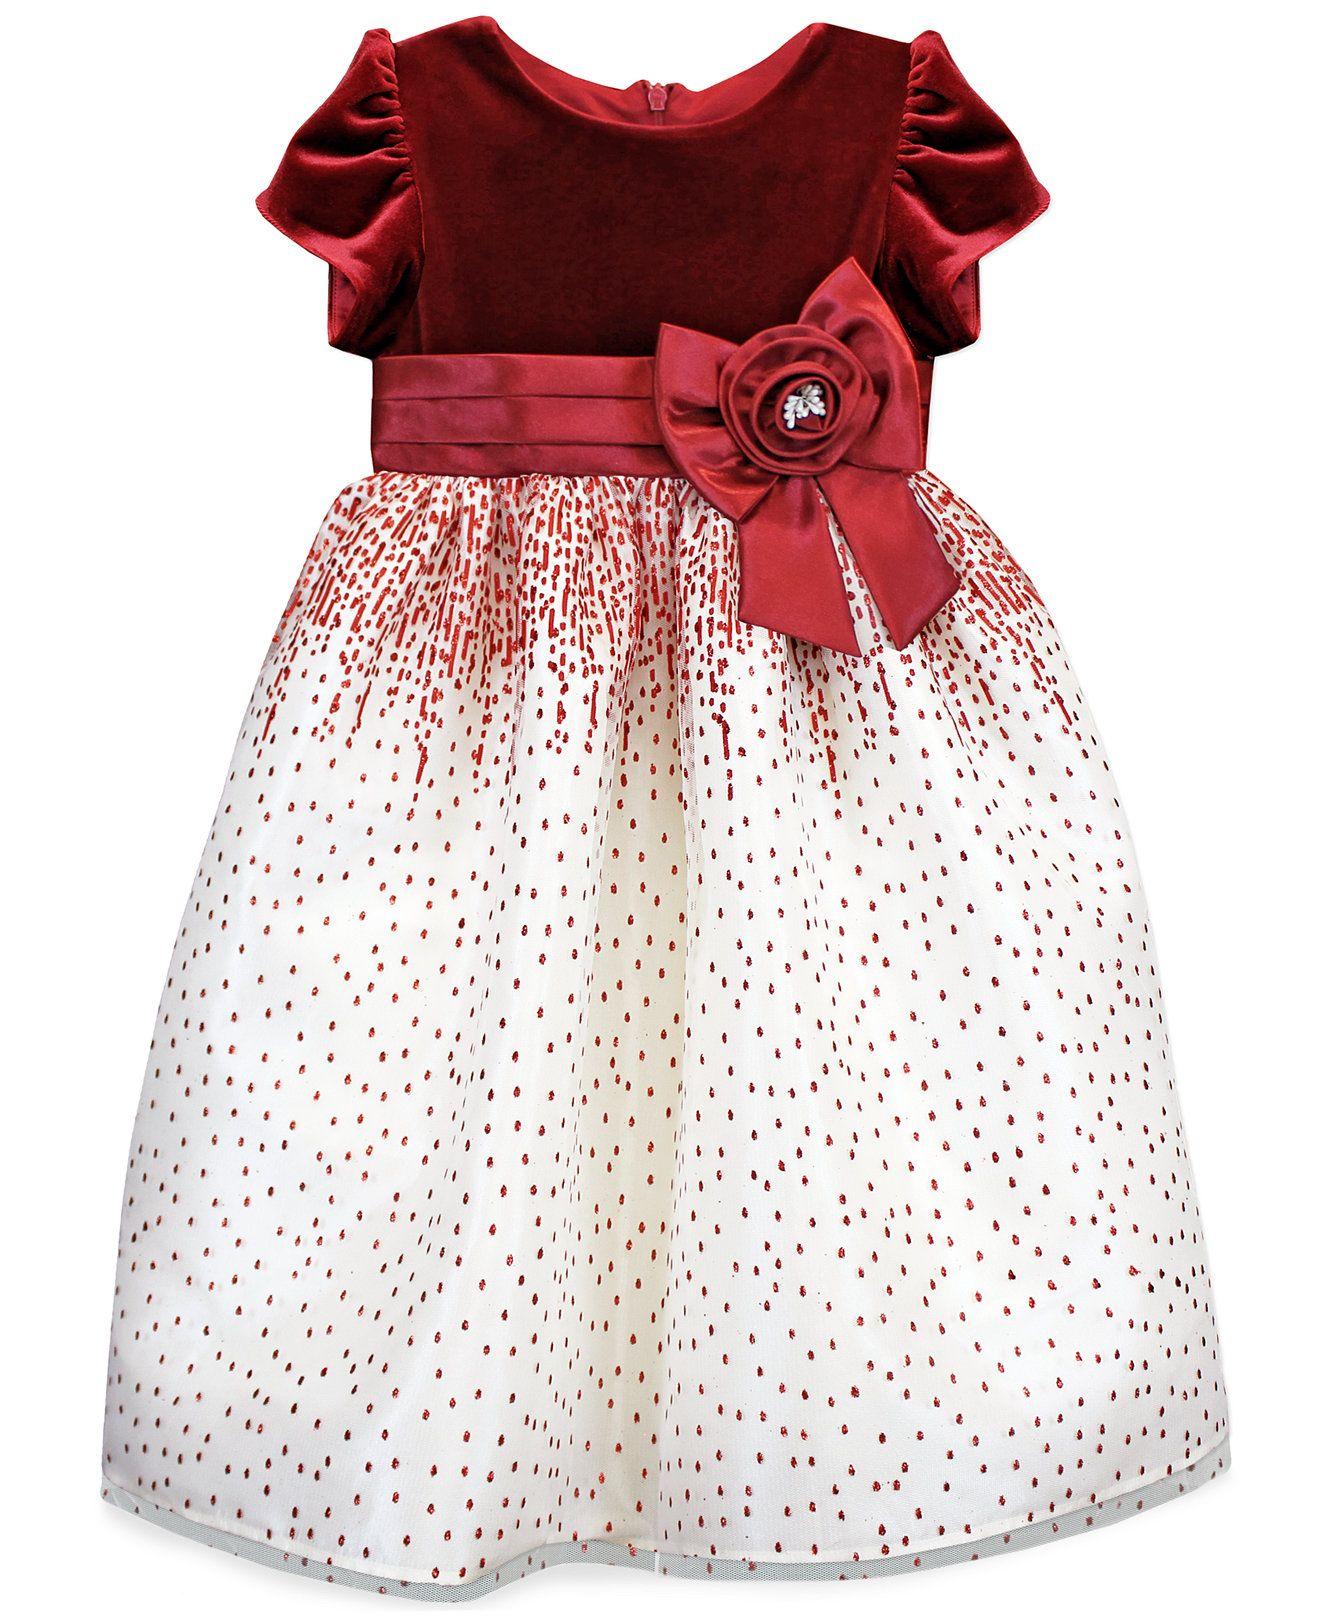 Jayne Copeland Girls' Velvet Holiday Dress - Kids - Macy's | Happy ...